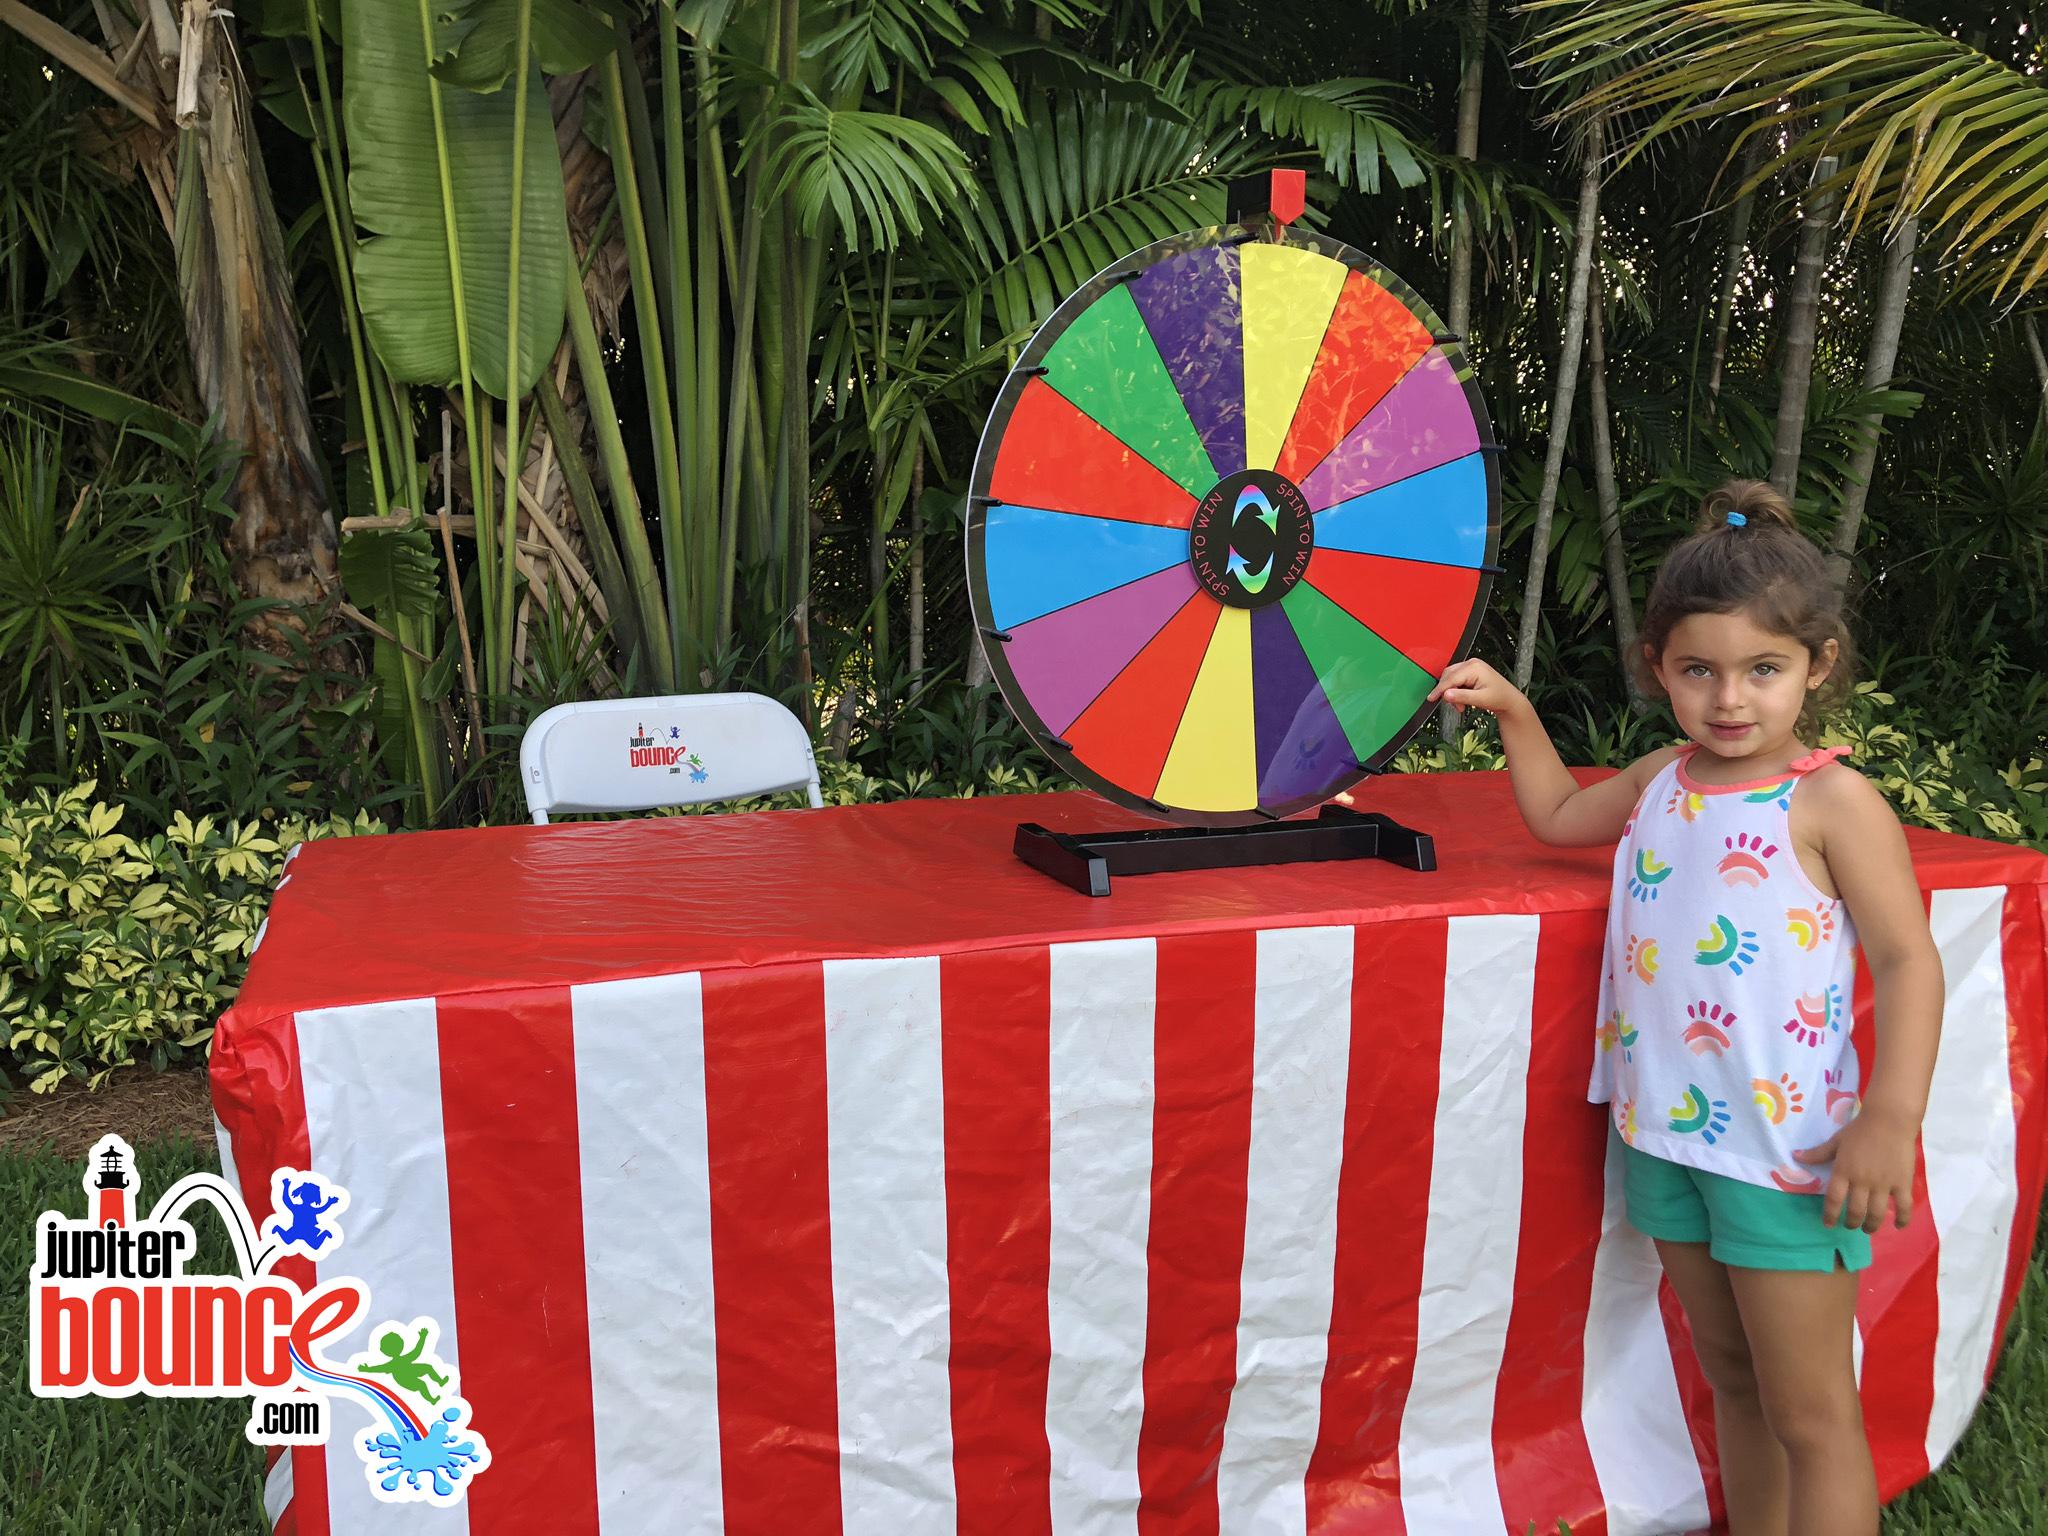 prizewheel-jupiterbouncehouserental-palmbeachgardens-loxahatchee-wellington-stuart-rockwallrental-photobooth.jpg